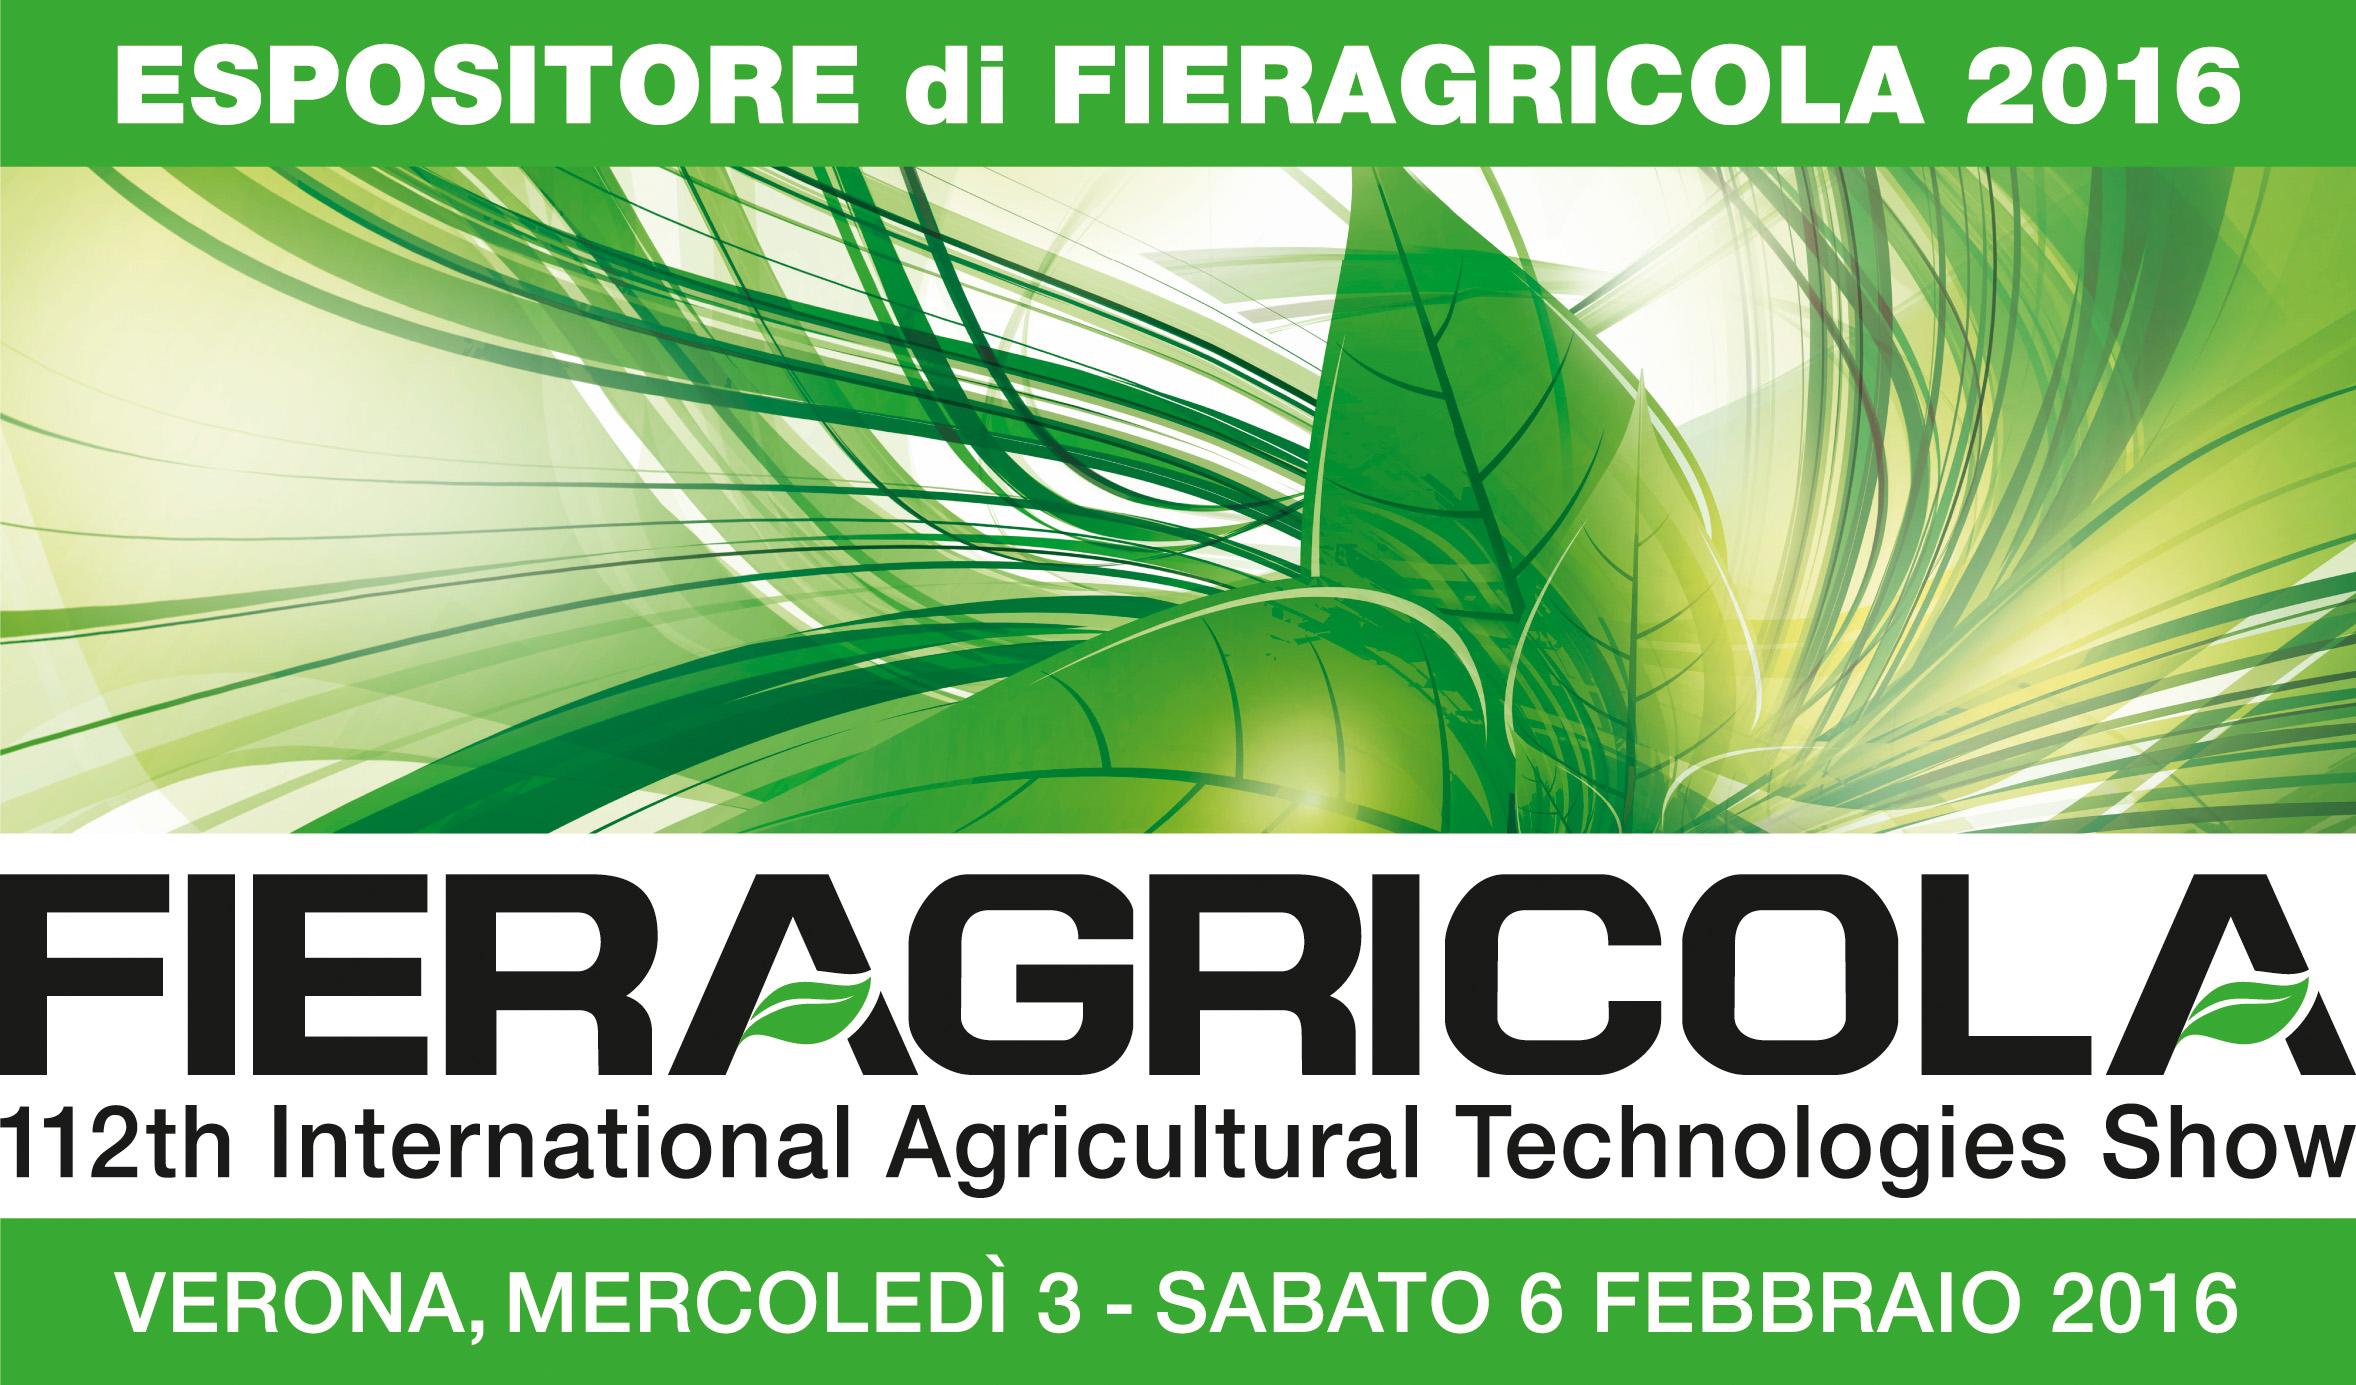 logo Fieragricola Espositore data